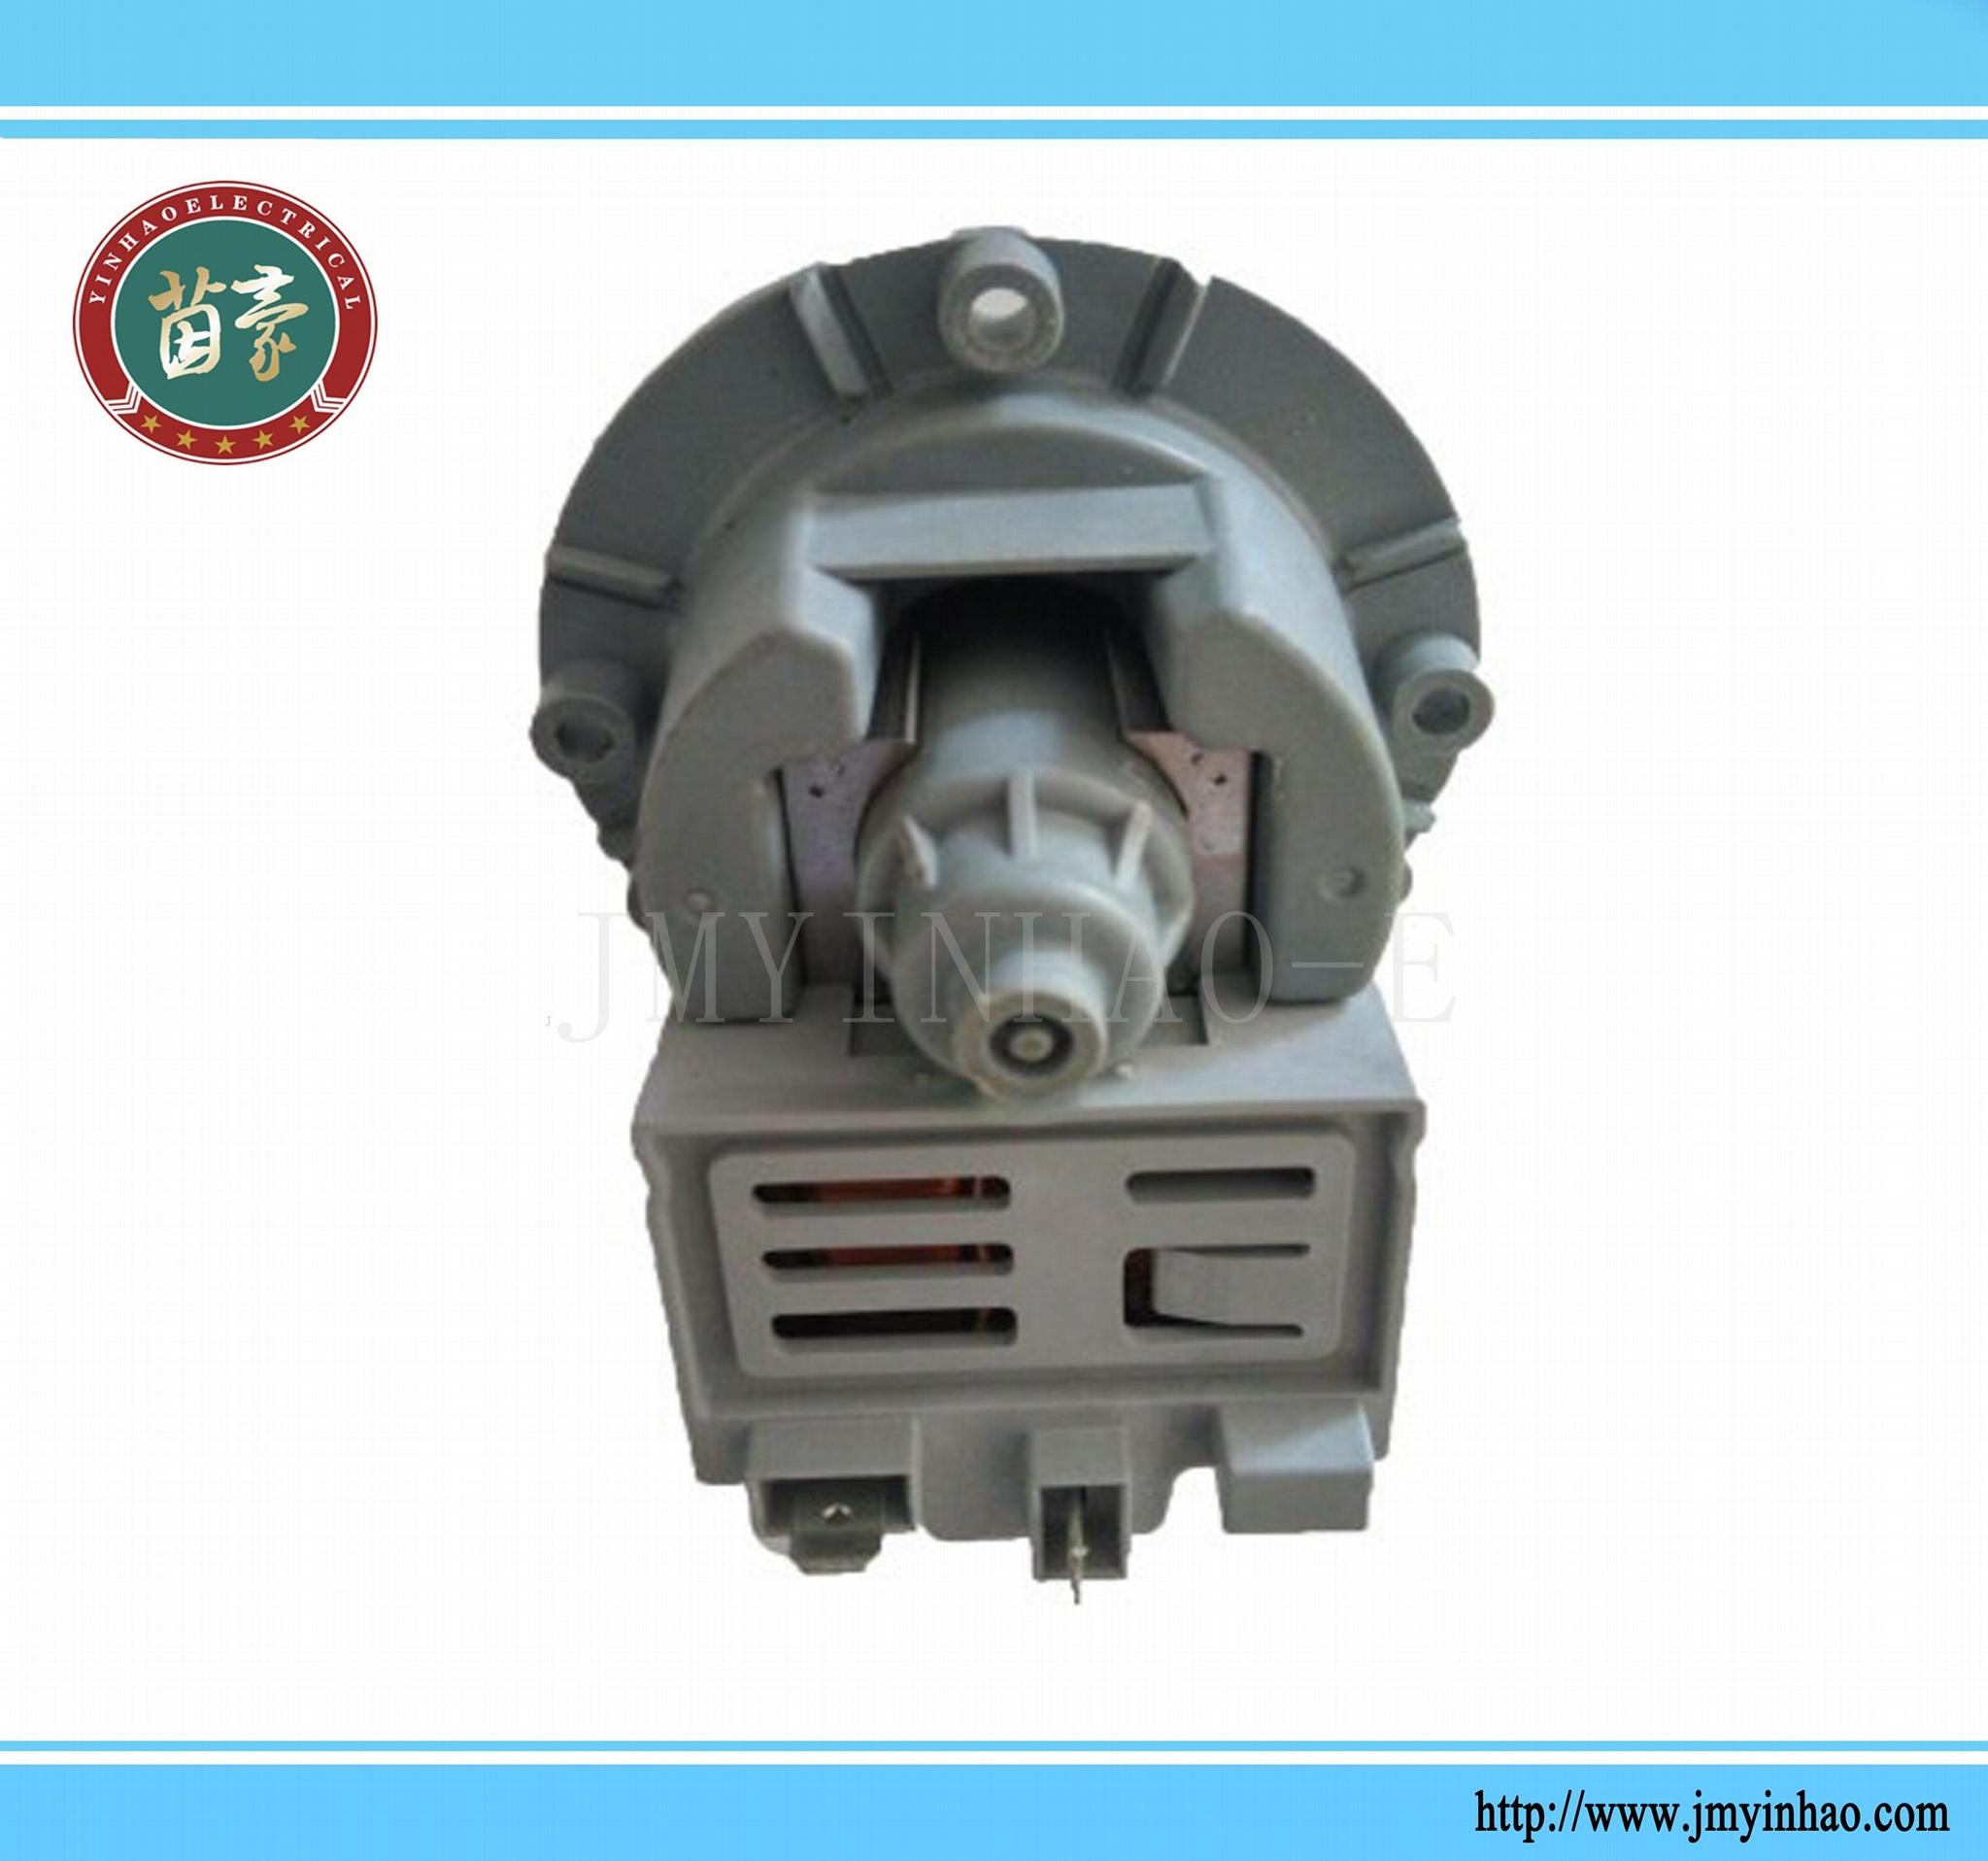 Replacement Askoll M231XP drain motor/40W Washer drain water pump 1